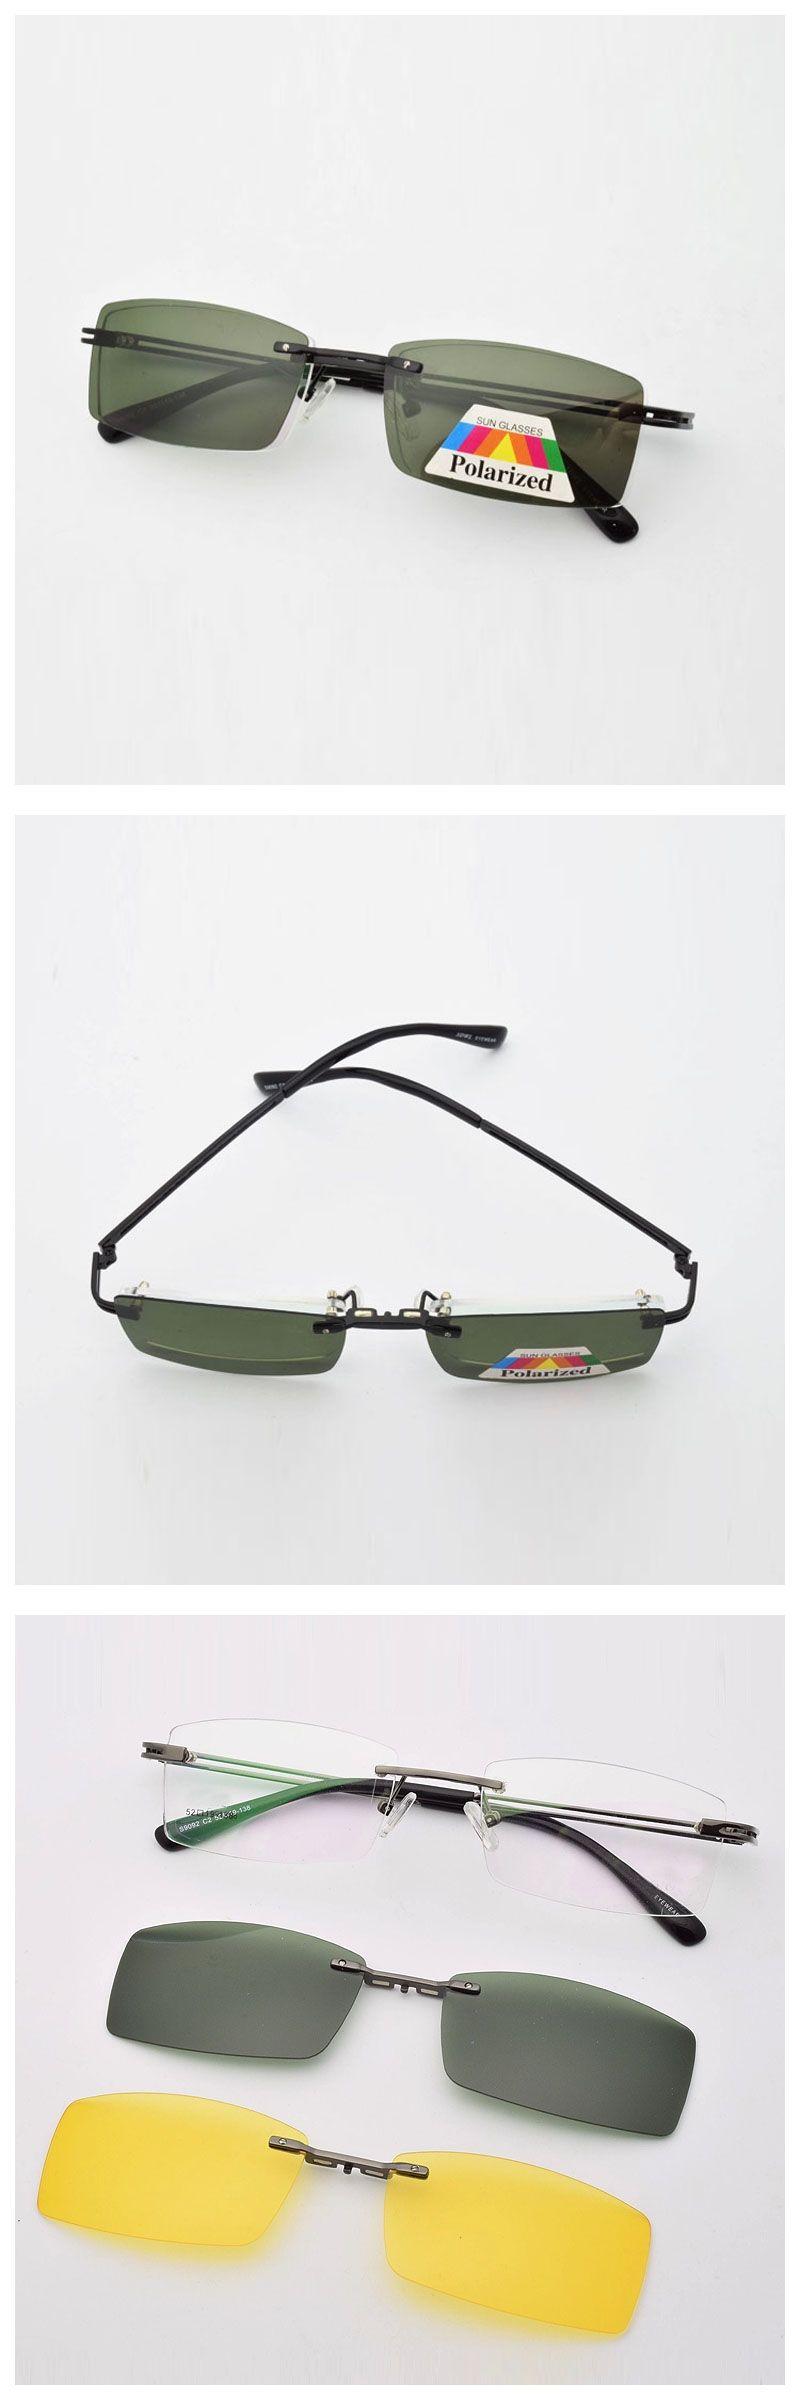 Frame Free Glasses Frame With Magnet Clip Film Myopia Gray Glasses